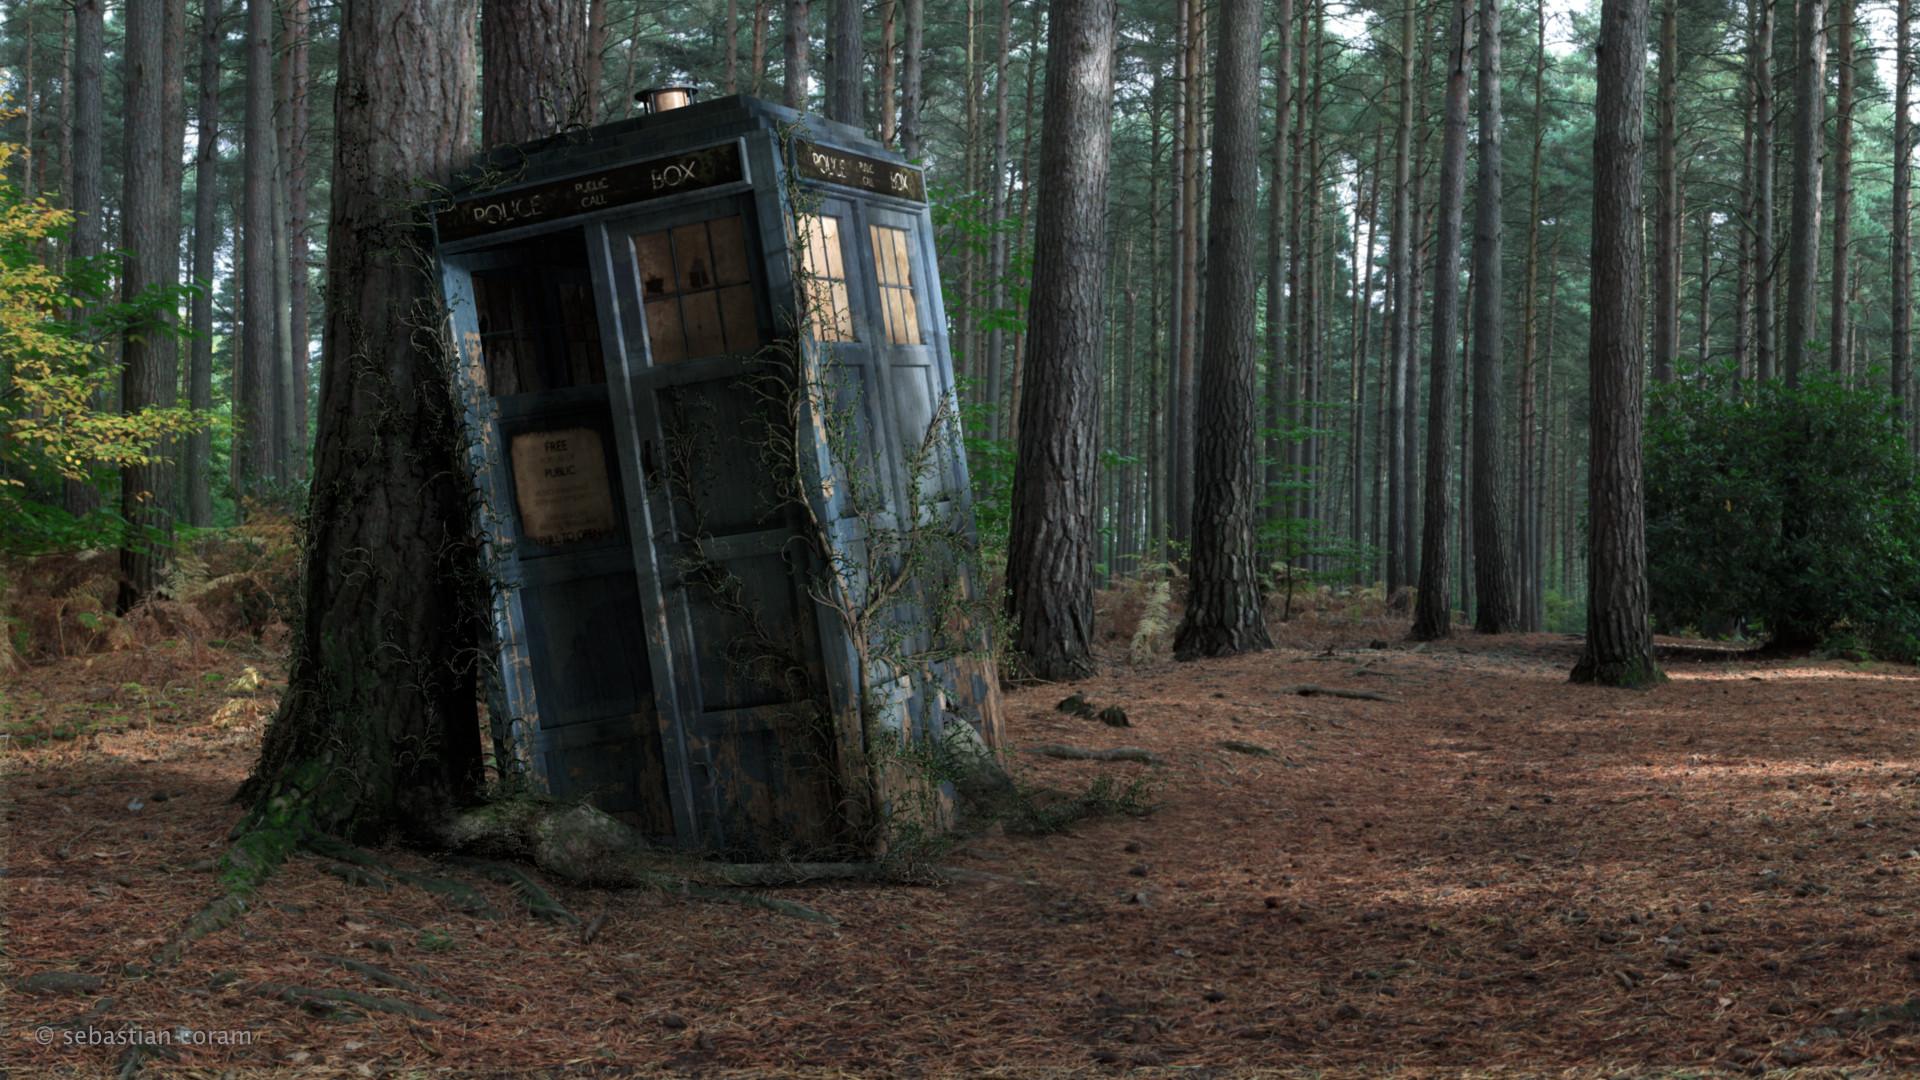 Doctor Who: Damaged Police Box